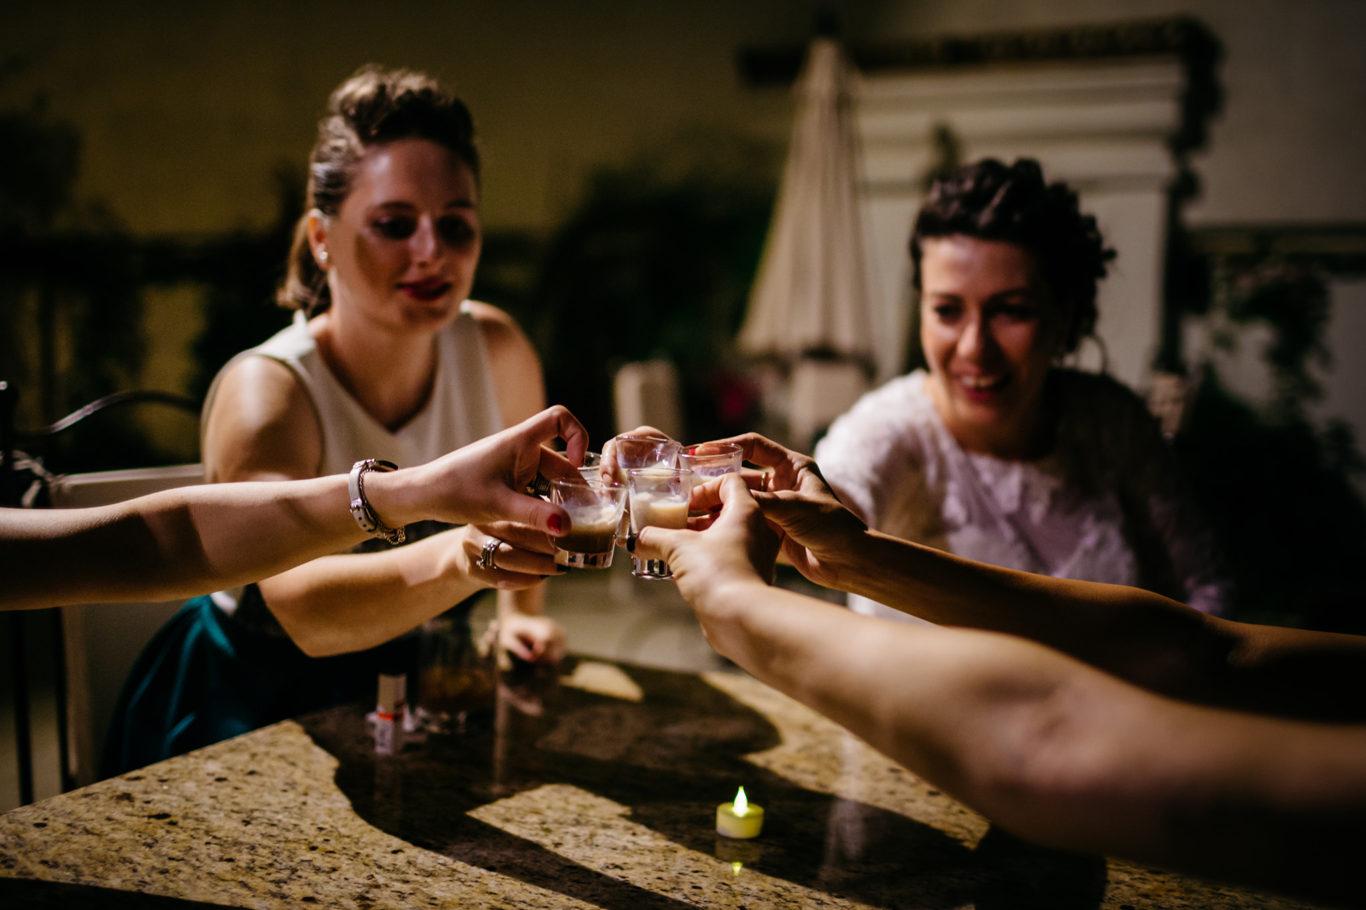 0695-fotografie-nunta-bucuresti-anca-george-fotograf-ciprian-dumitrescu-dcf_5966